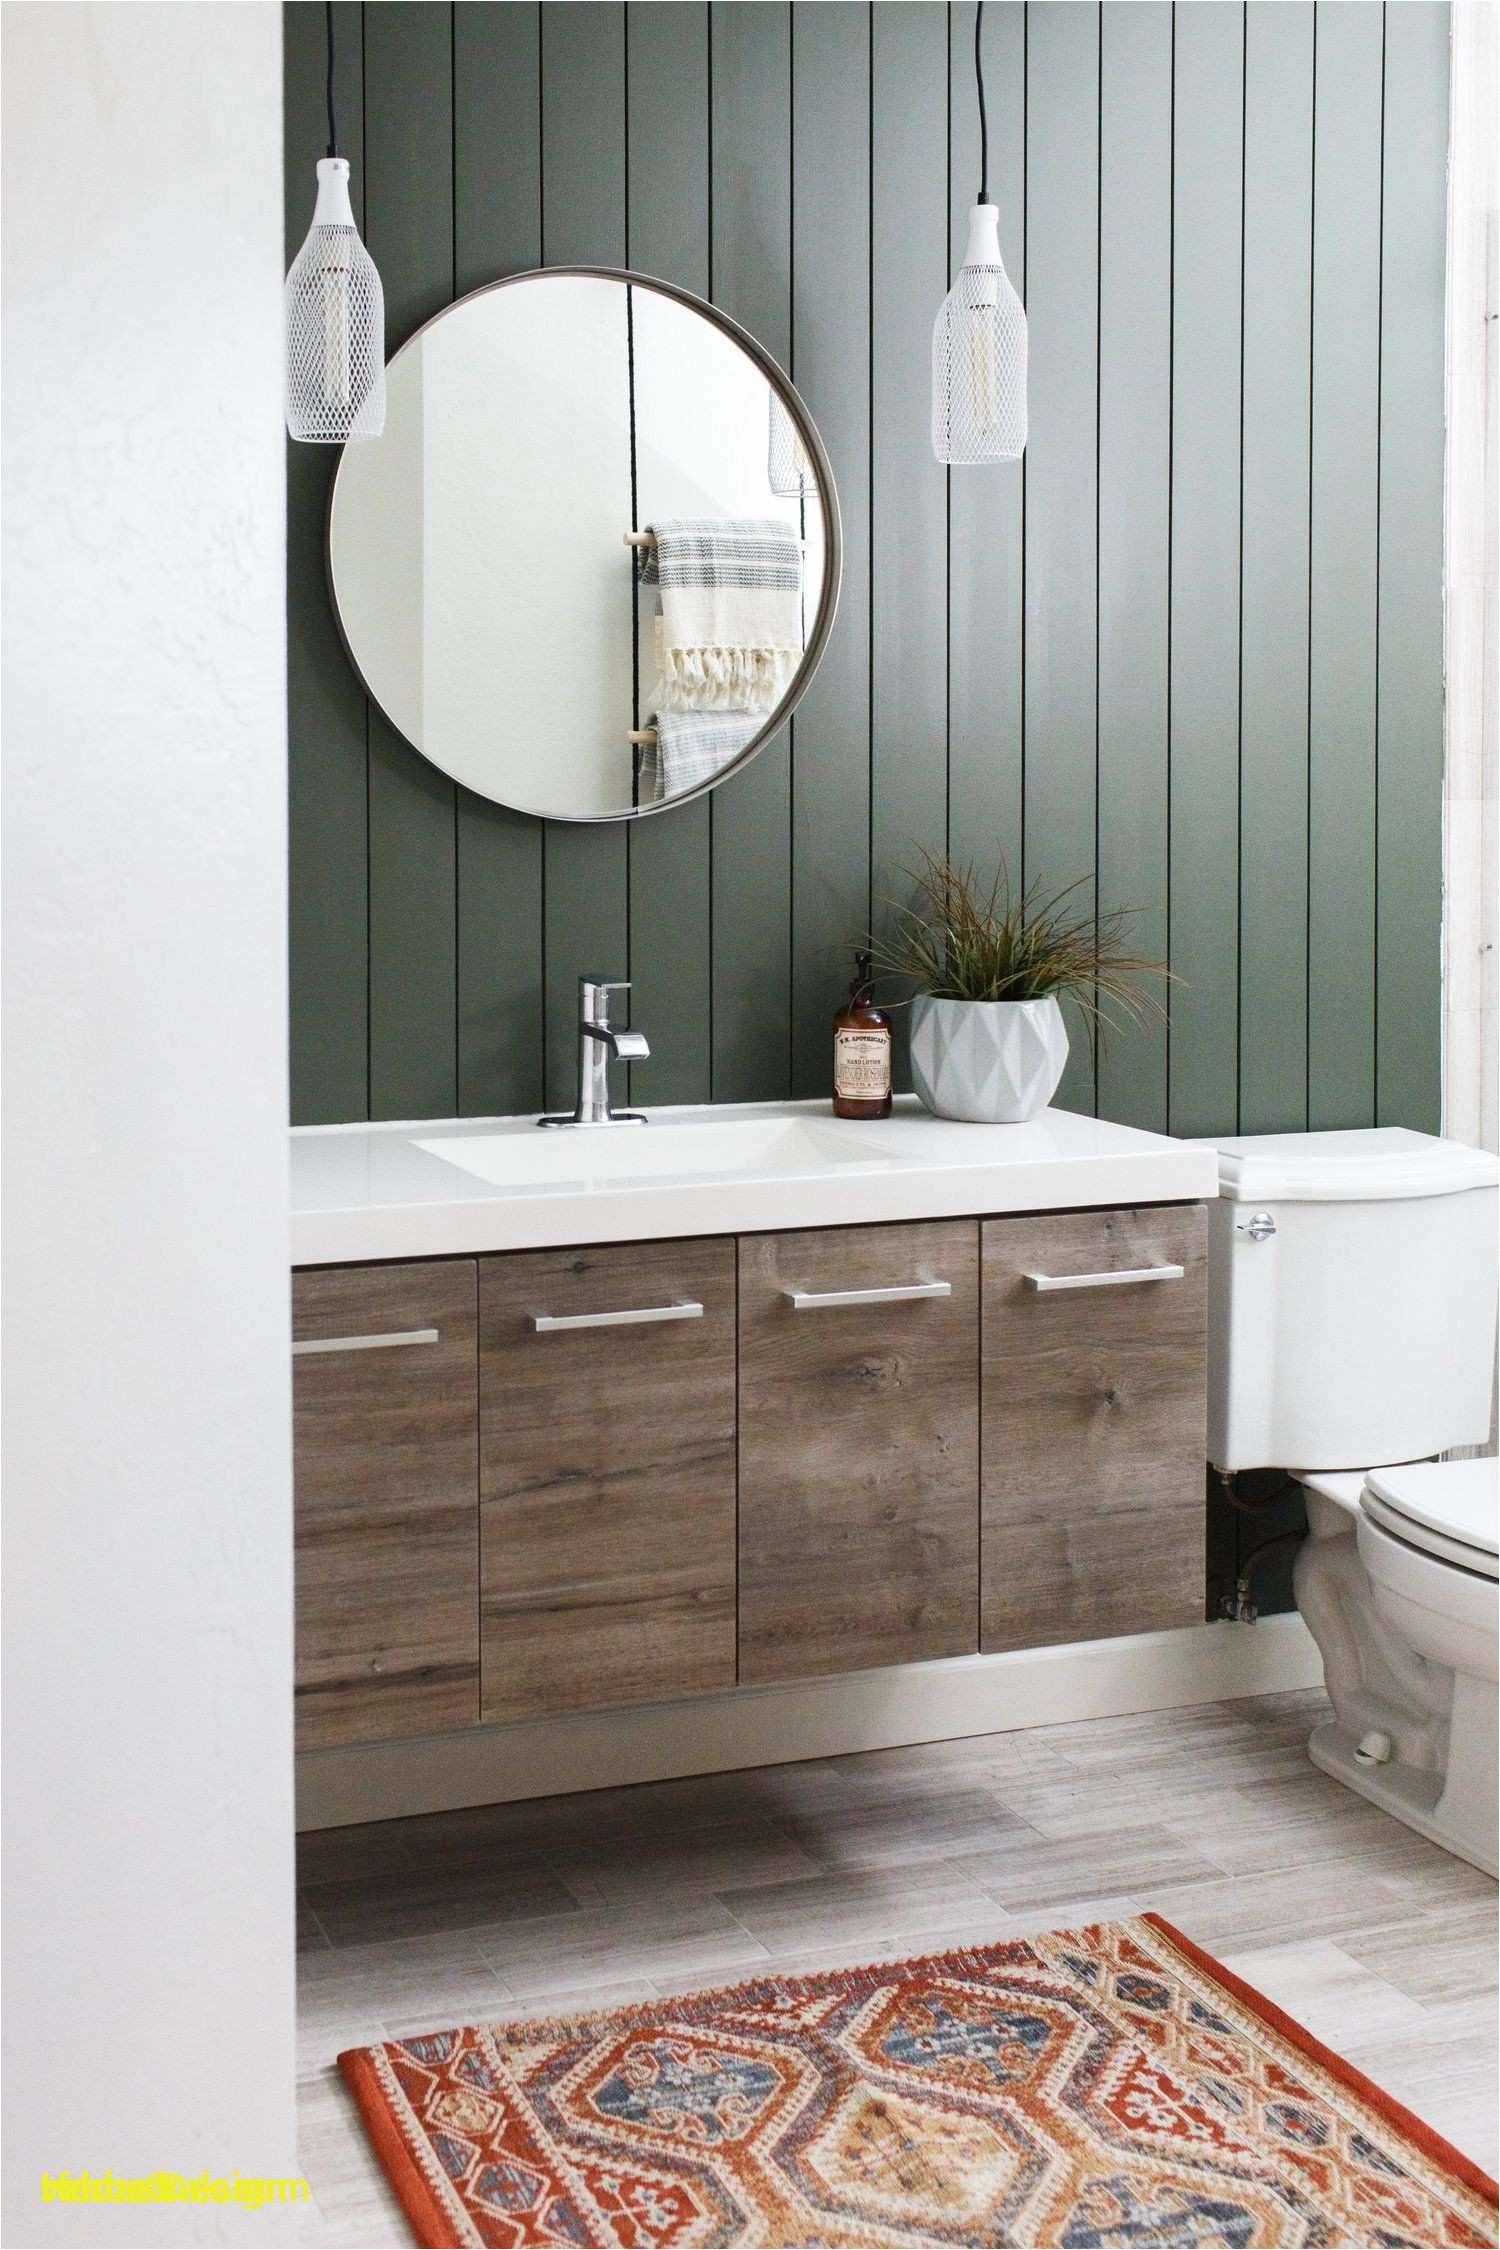 Bathroom Bathrooms Design Unique Diy Bathroom Light Luxury H Sink Install Bathroom I 0d Exciting New